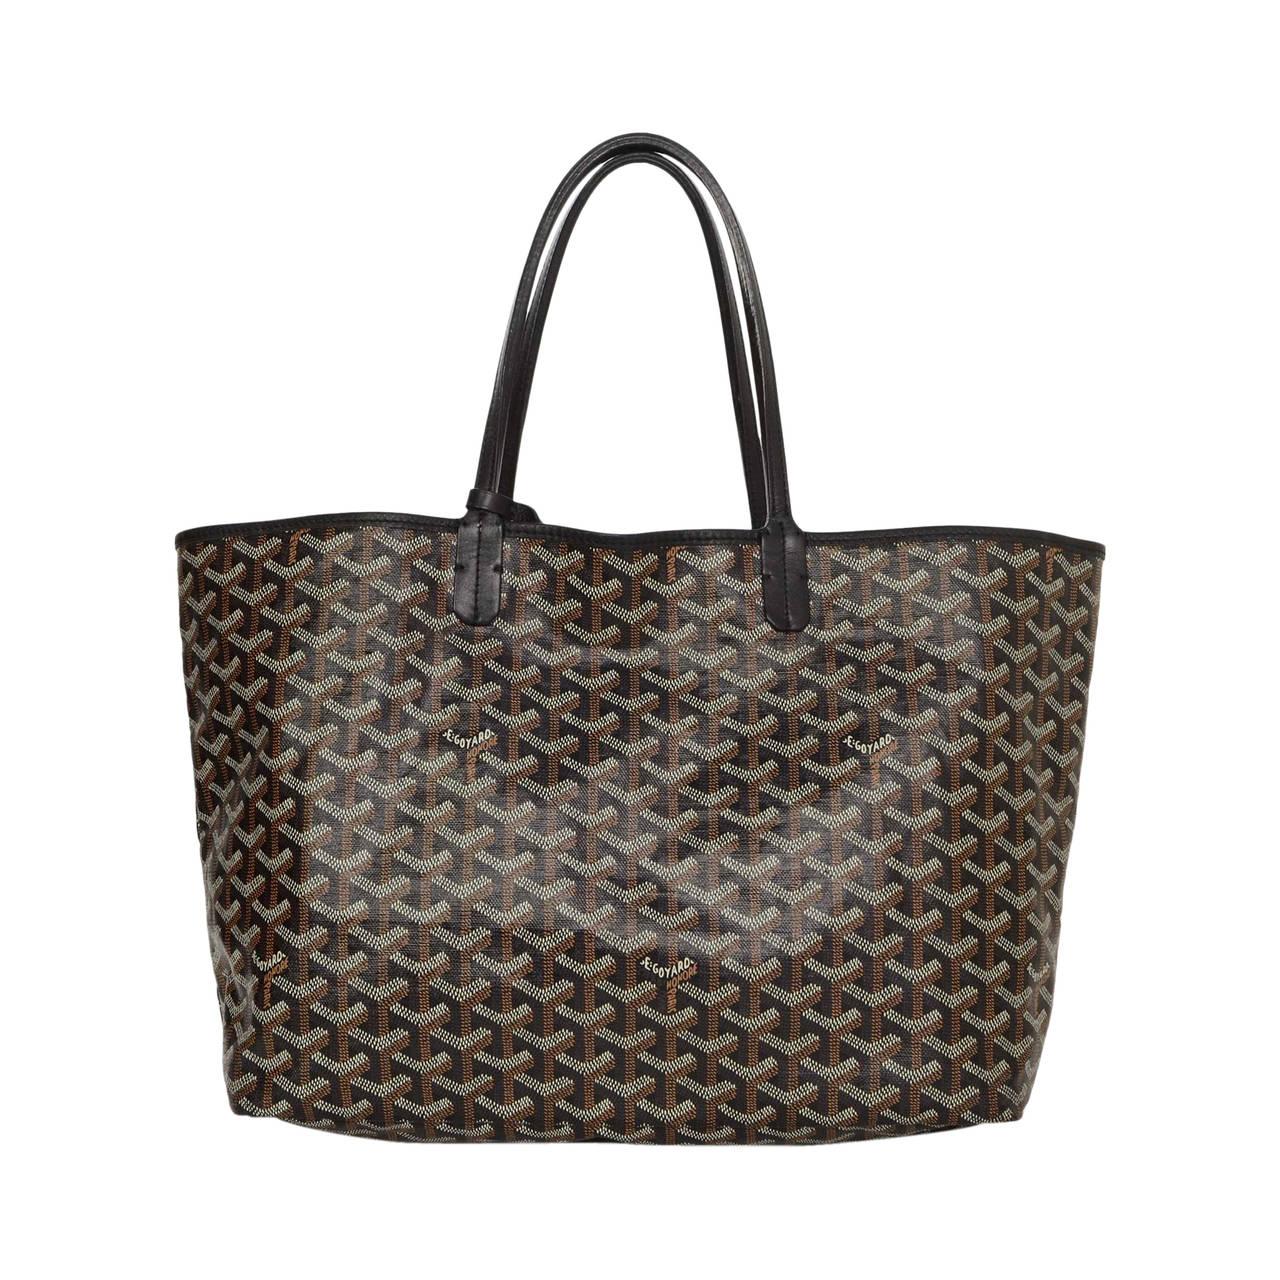 Goyard Chevron Print Coated Canvas St Louise Pm Tote Bag At 1stdibs. Gucci  Handbag Gg Large ... 7678a450d53cf